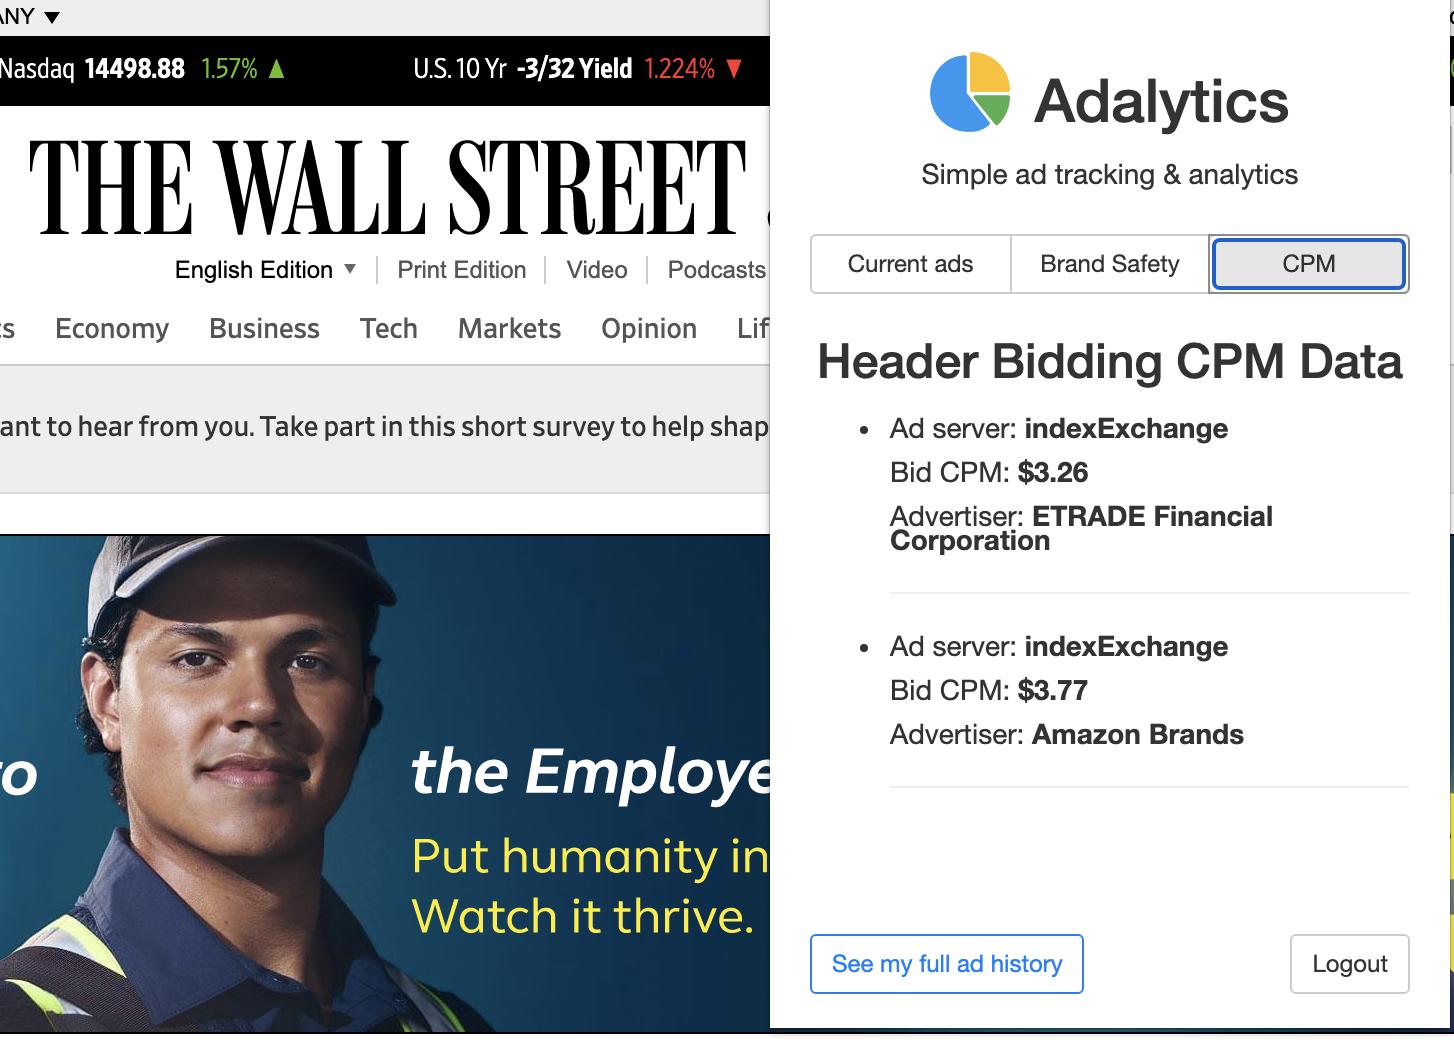 Adalytics browser extension showing header bidding data